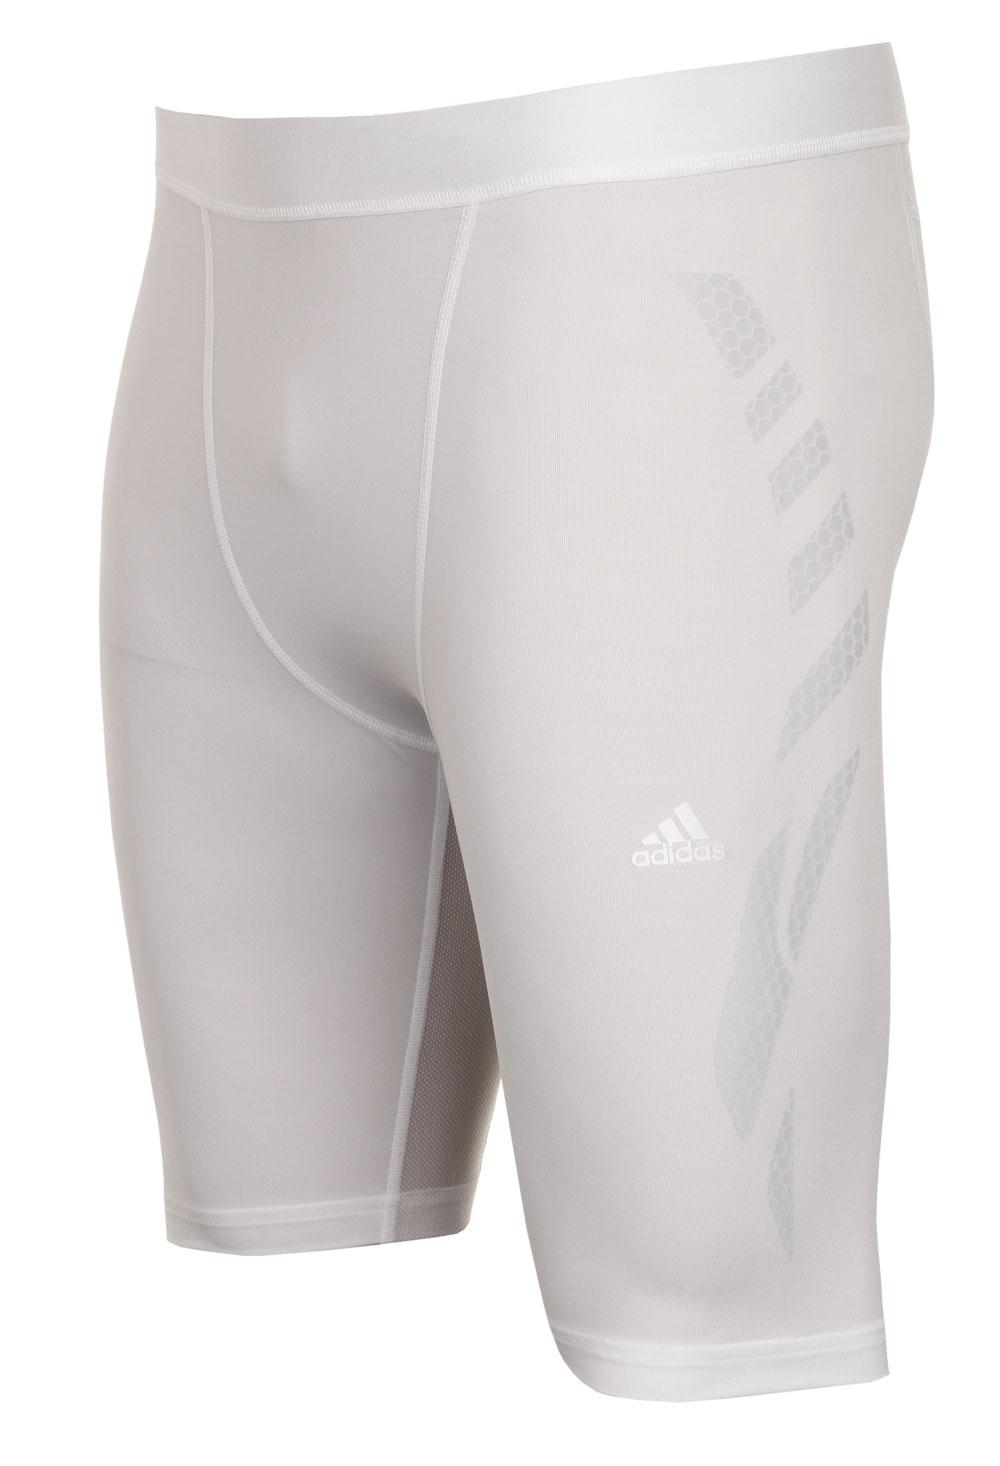 New Adidas Mens TechFit Preparation Base Layer Tight Training Shorts ALL SIZES